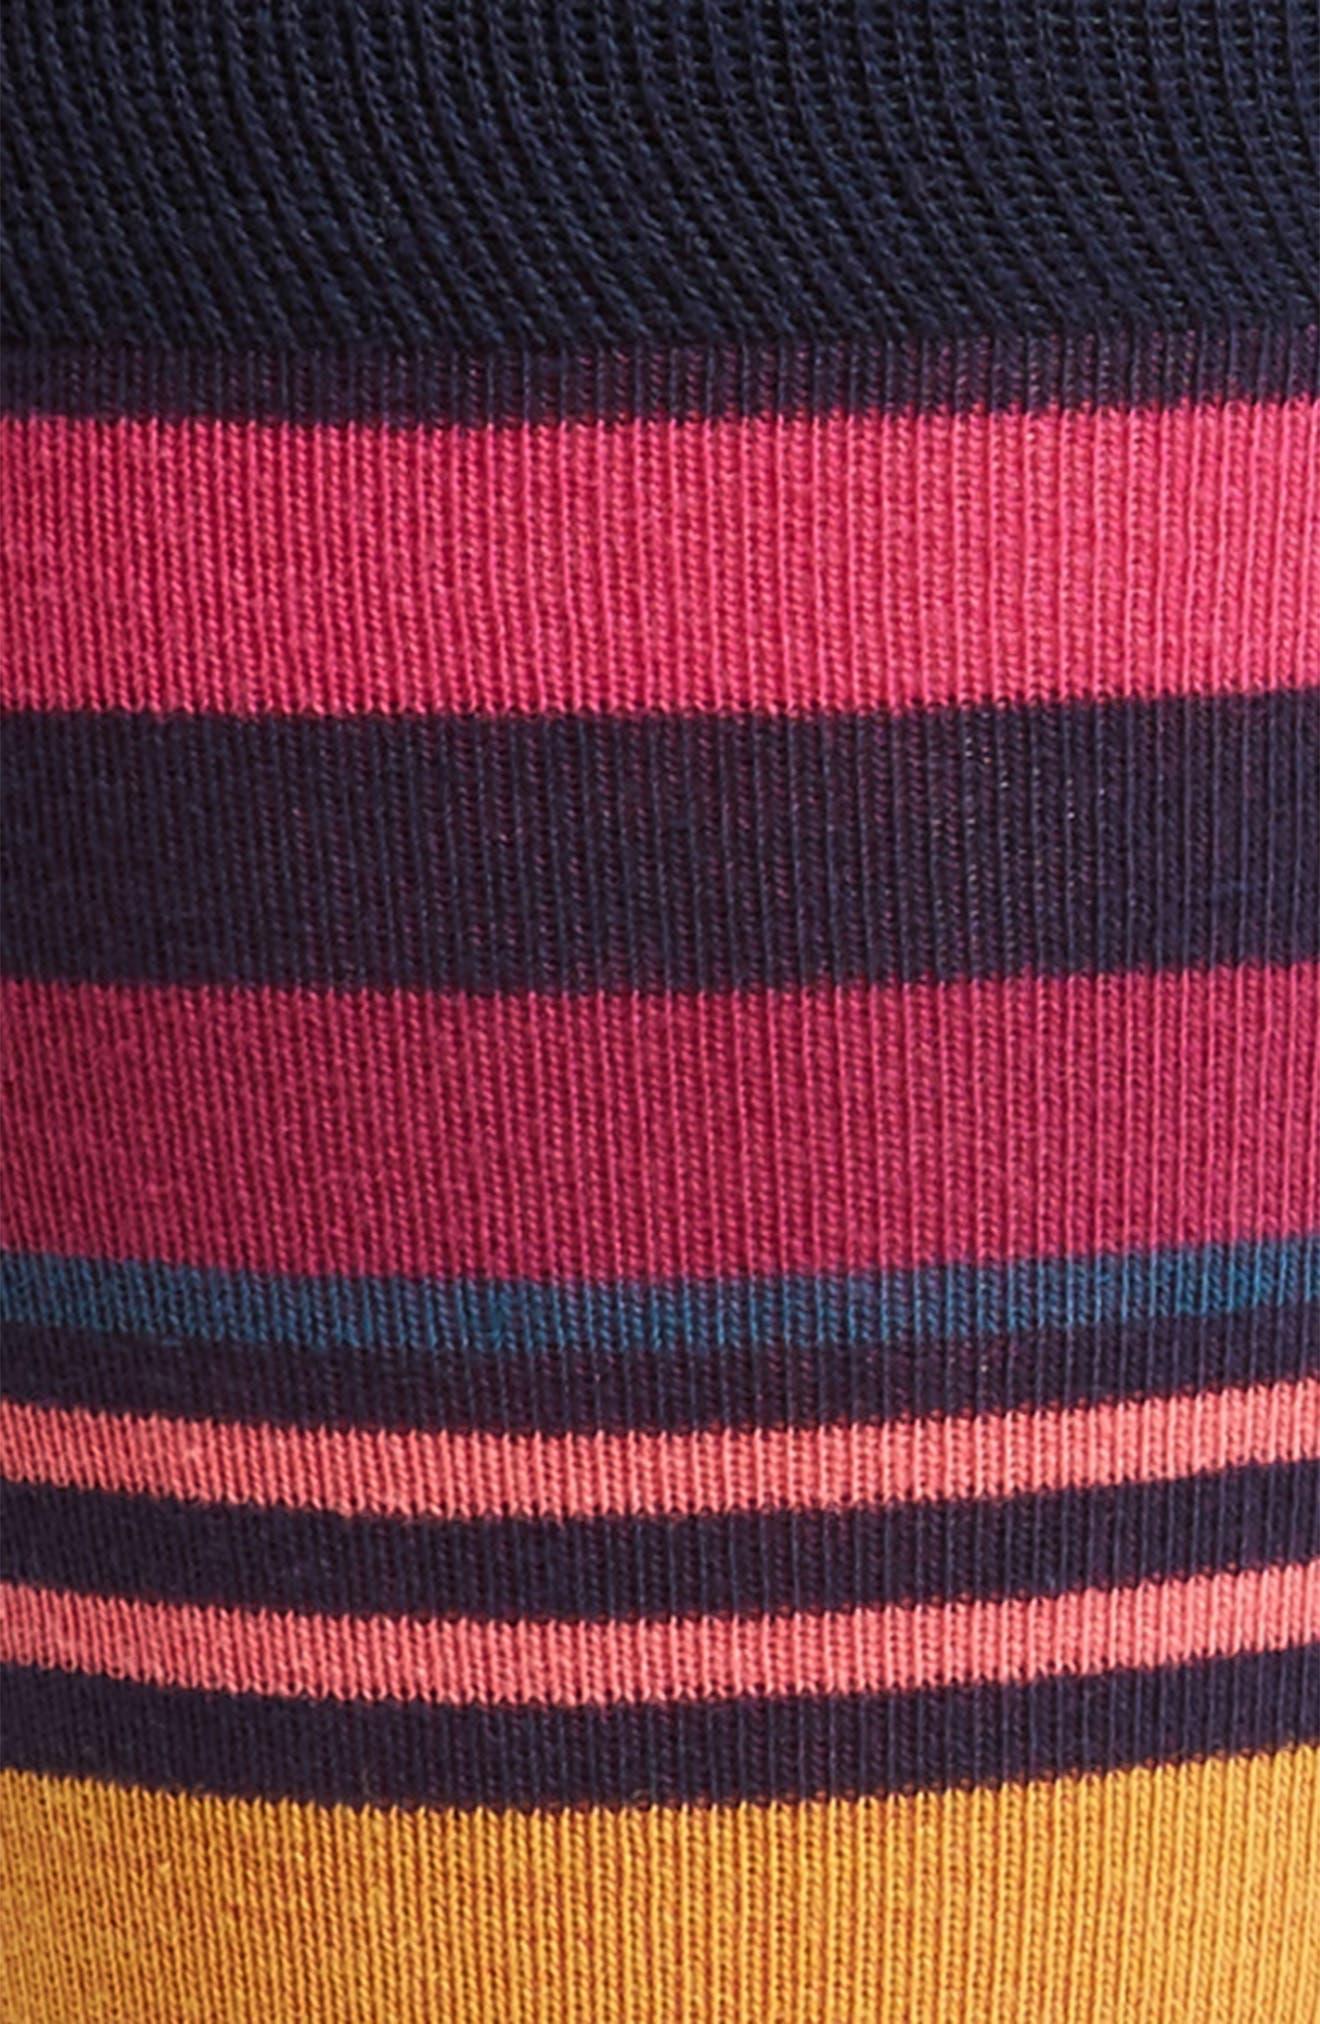 Multi Stripe Socks,                             Alternate thumbnail 2, color,                             NAVY/ PINK